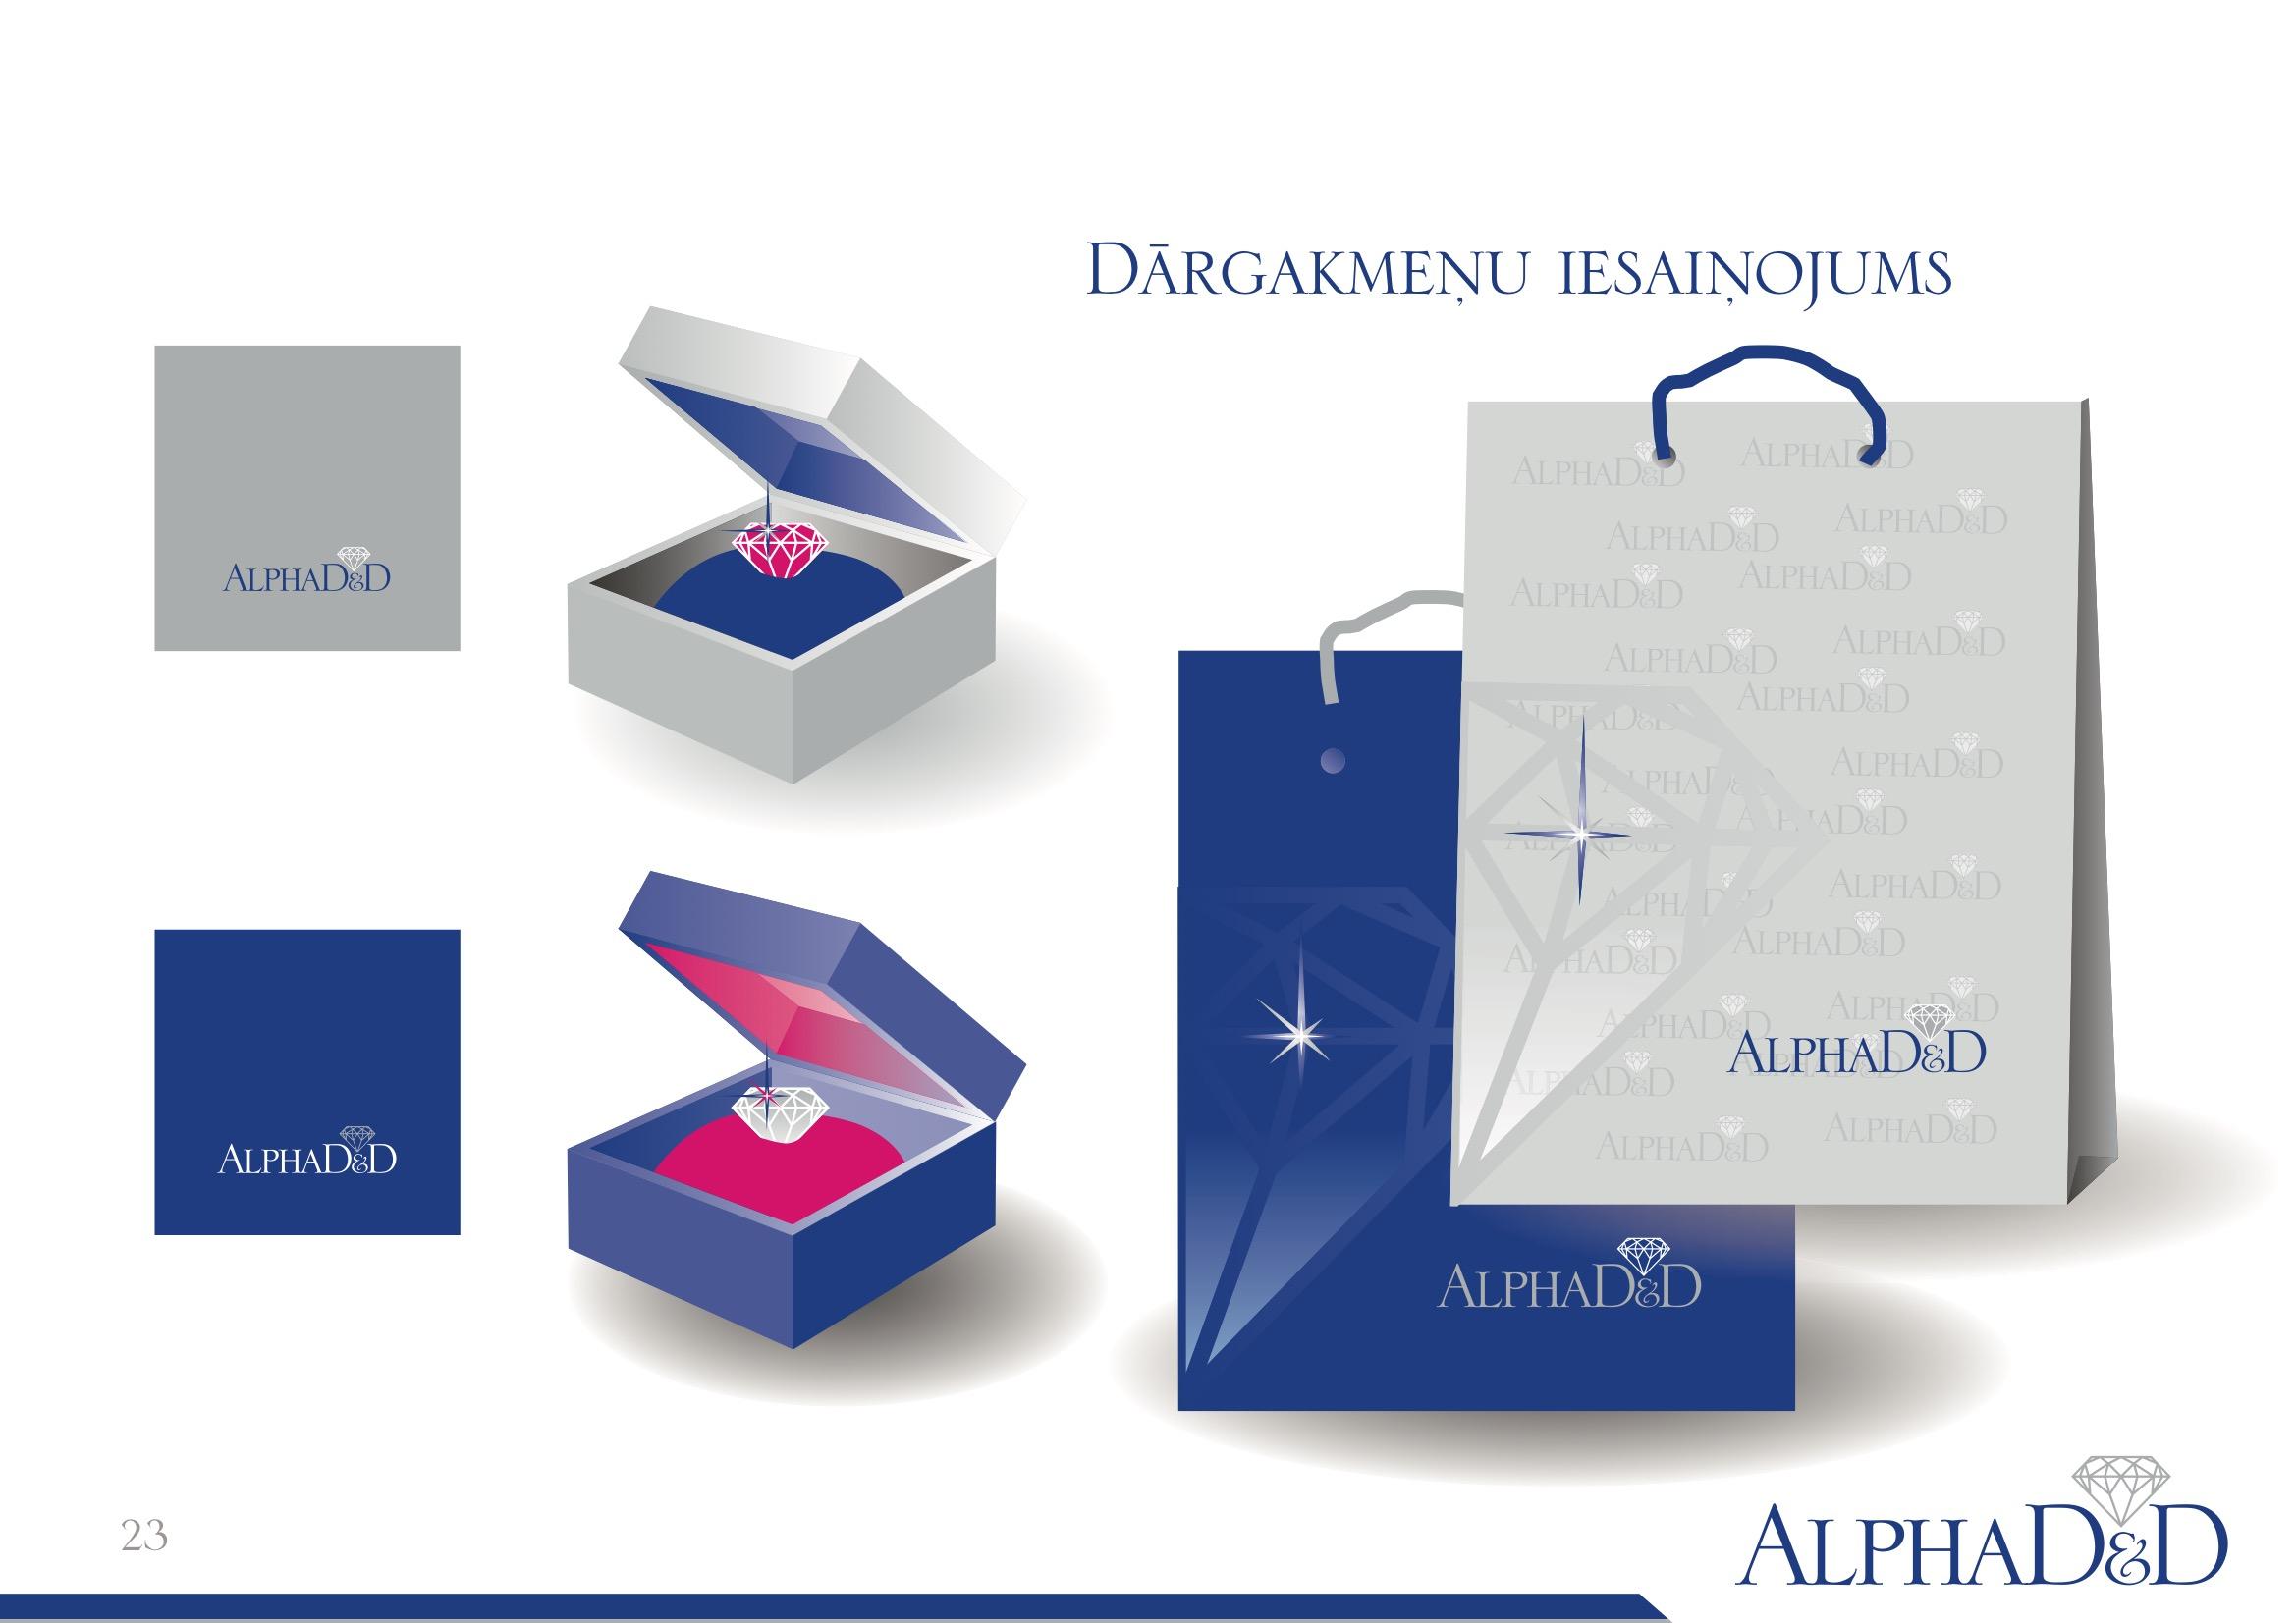 AlphaDD_Stils 23